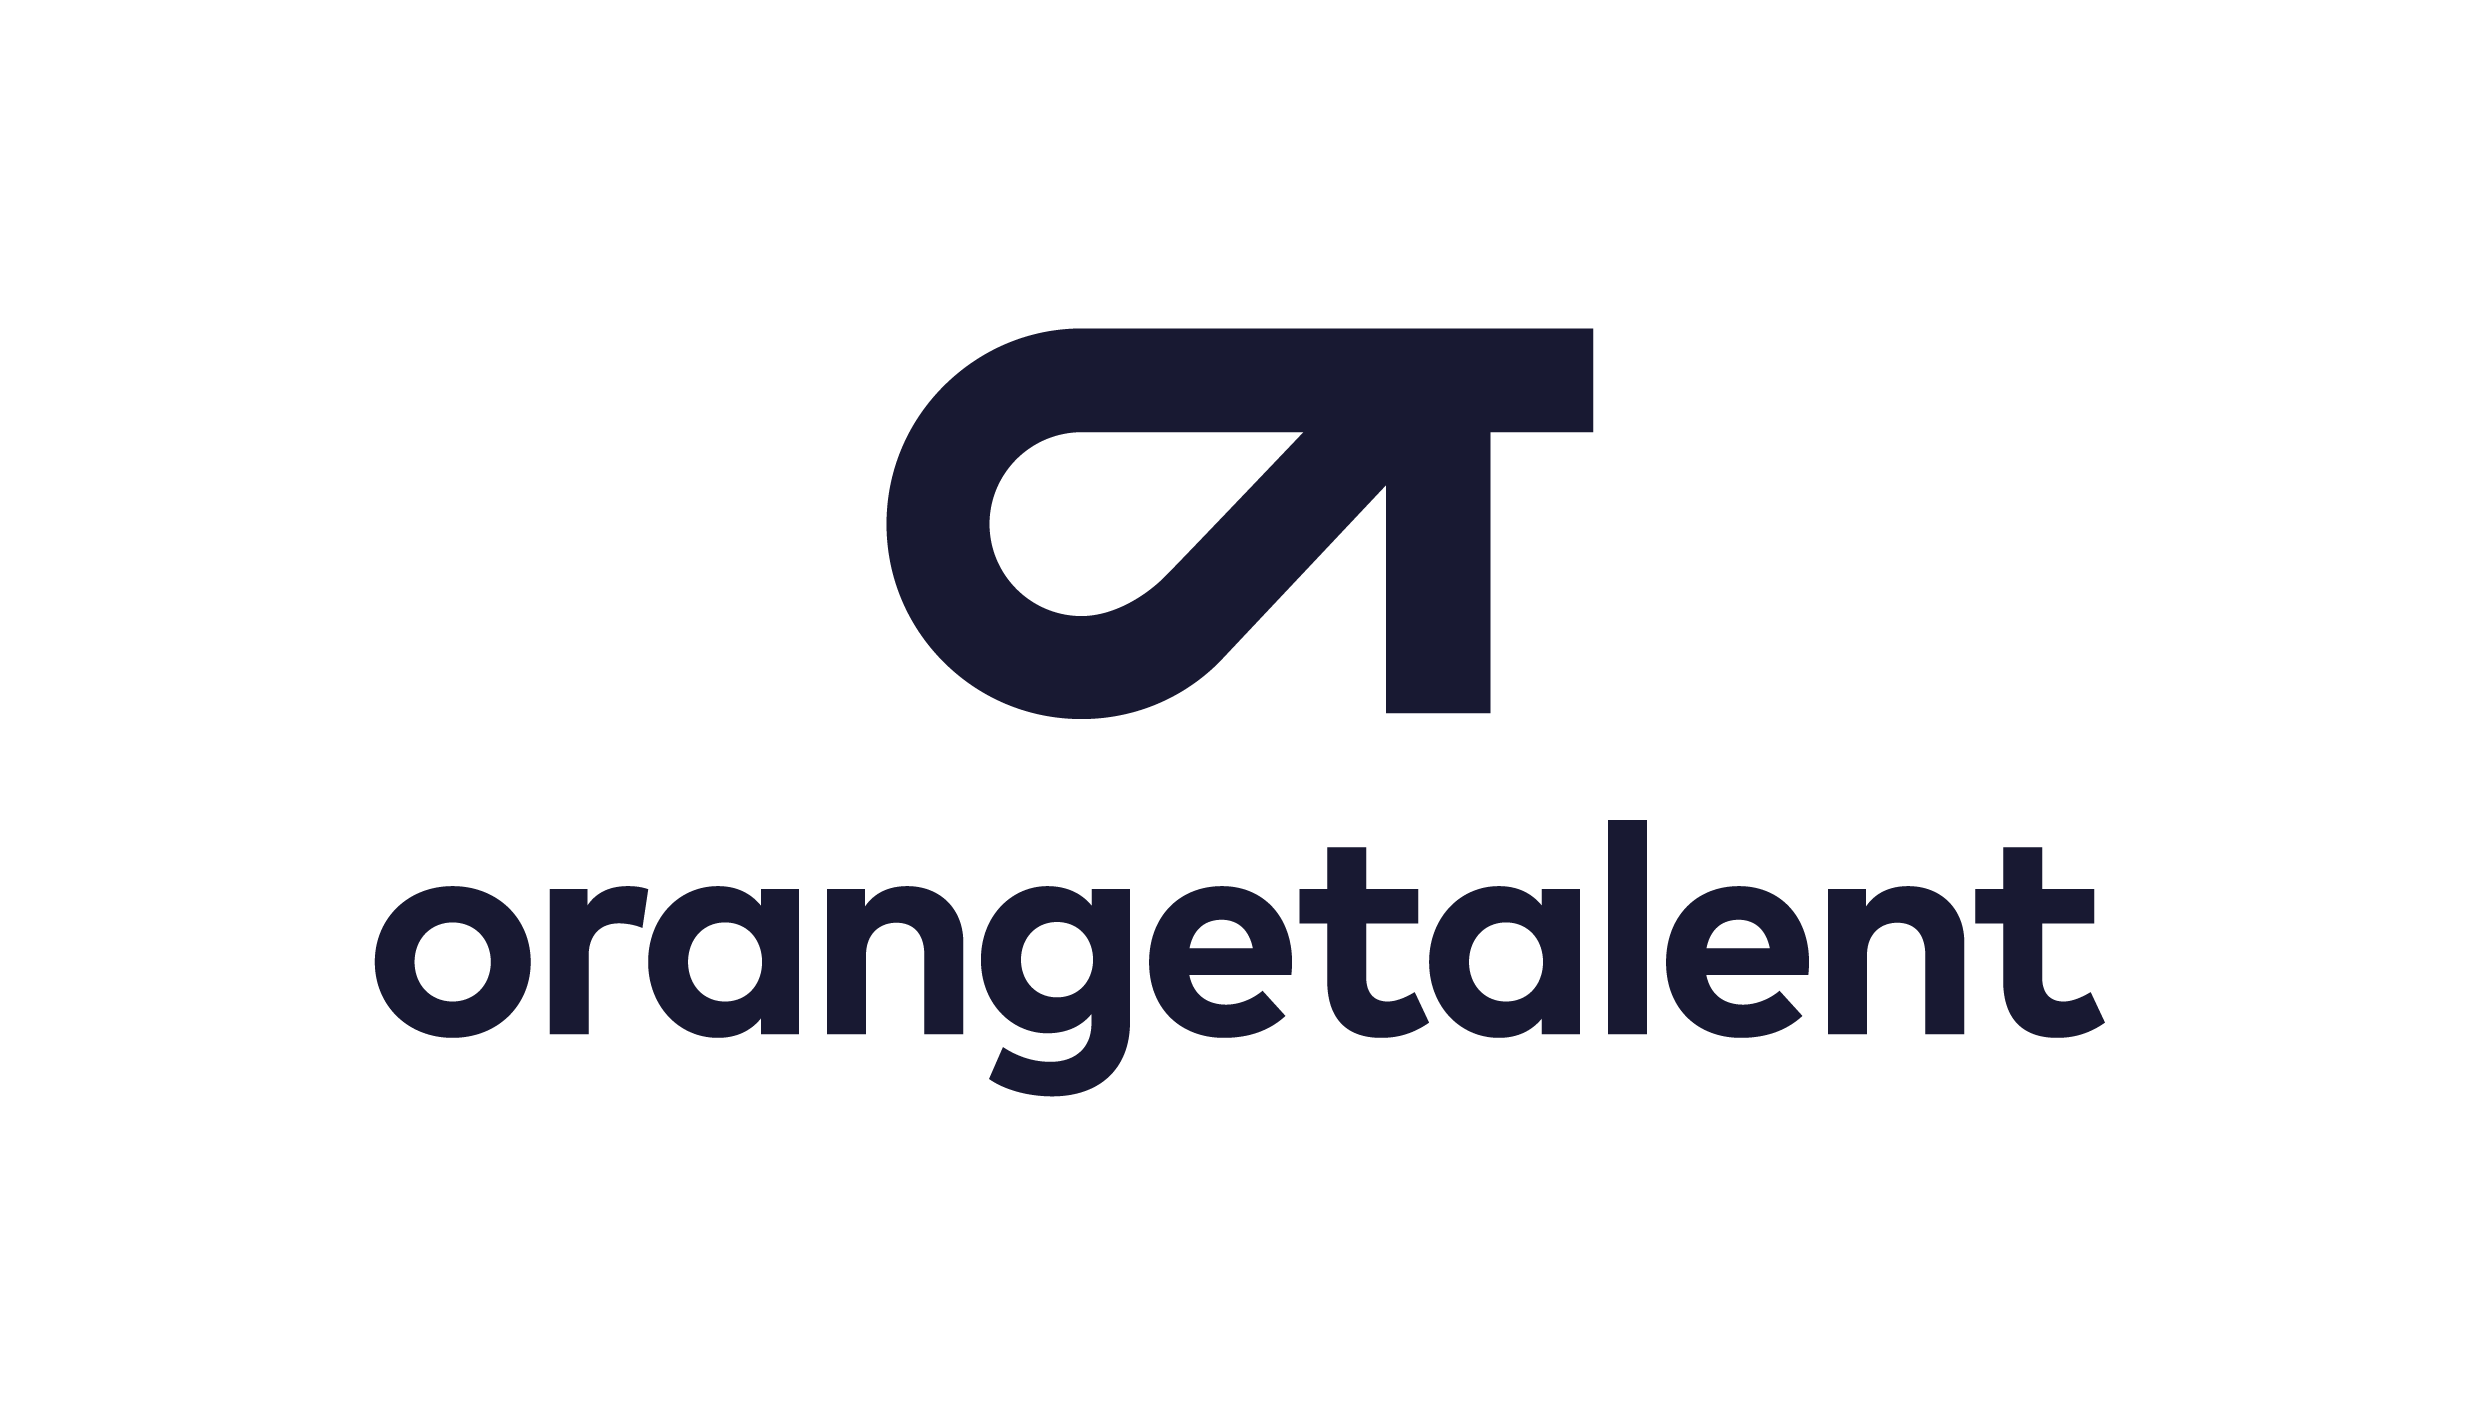 OrangeTalent - 15+ jaar ervaring